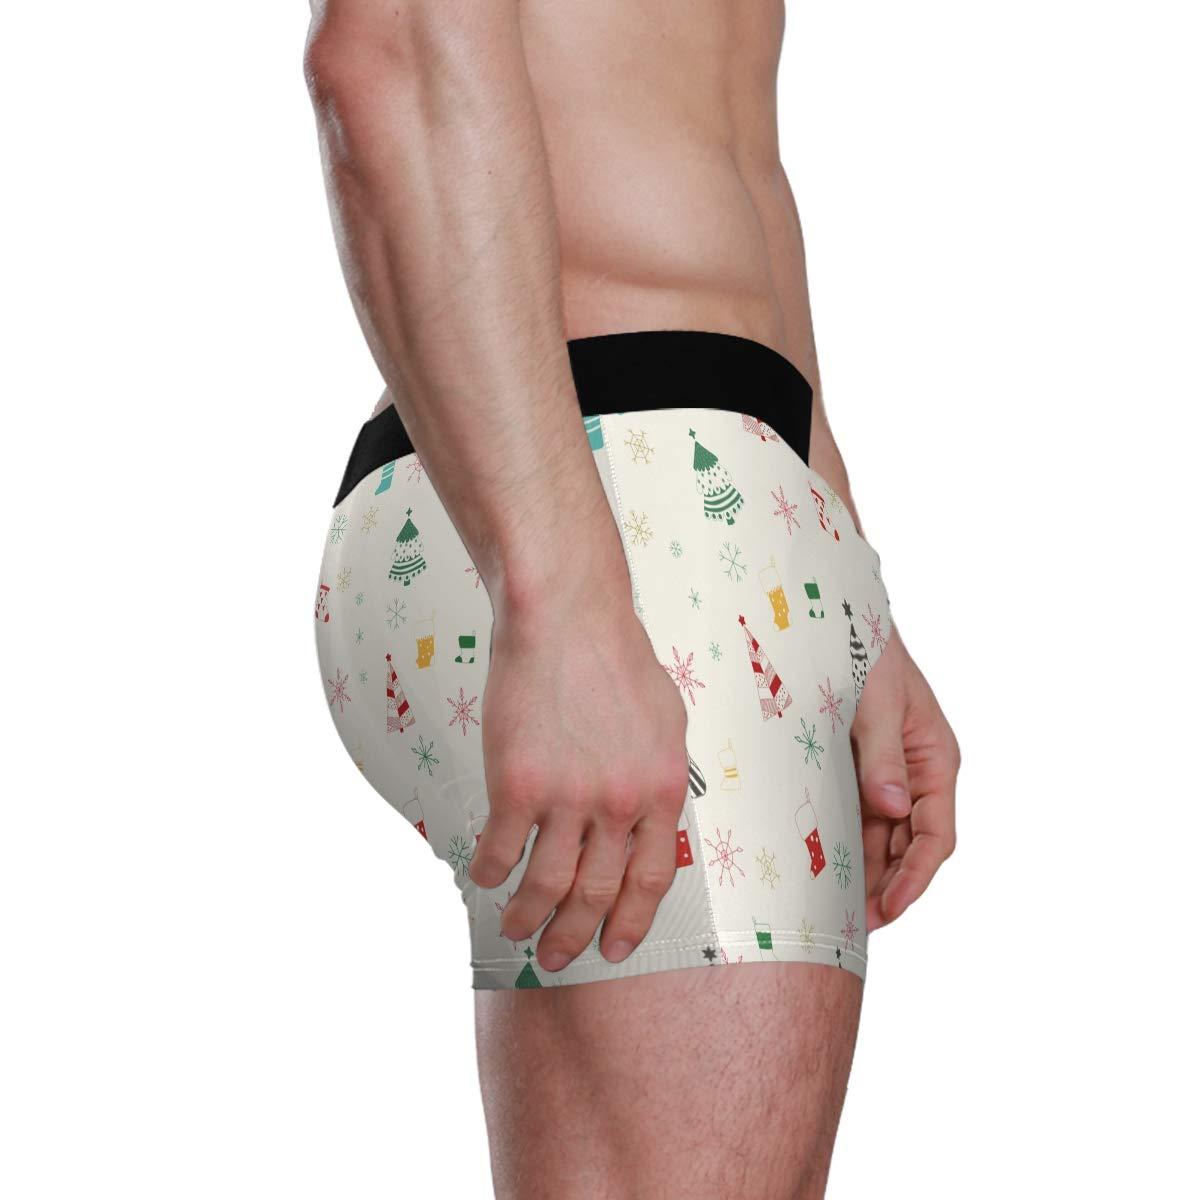 UNISE Christmas Tree Hanes Boxer Briefs Comfortable Briefs Soft Boyshorts Underwear for Men Pack